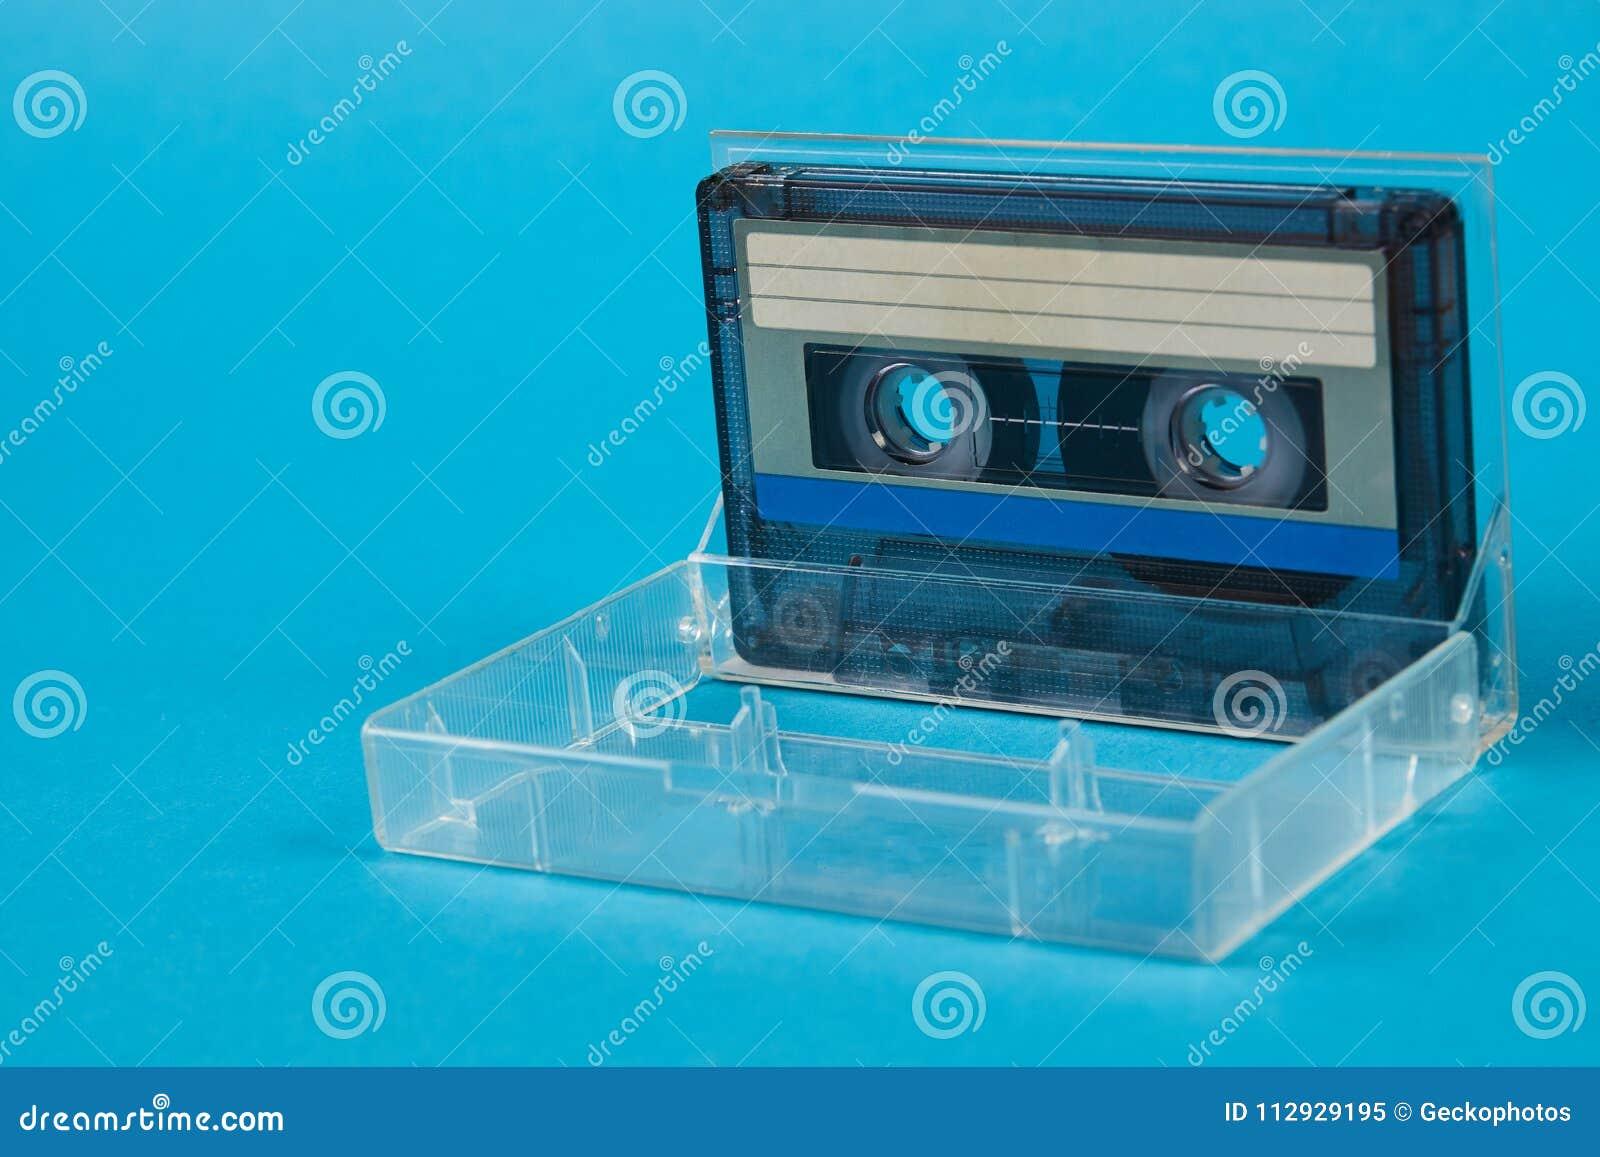 blank cassette tape box with retro cassette on blue. Black Bedroom Furniture Sets. Home Design Ideas